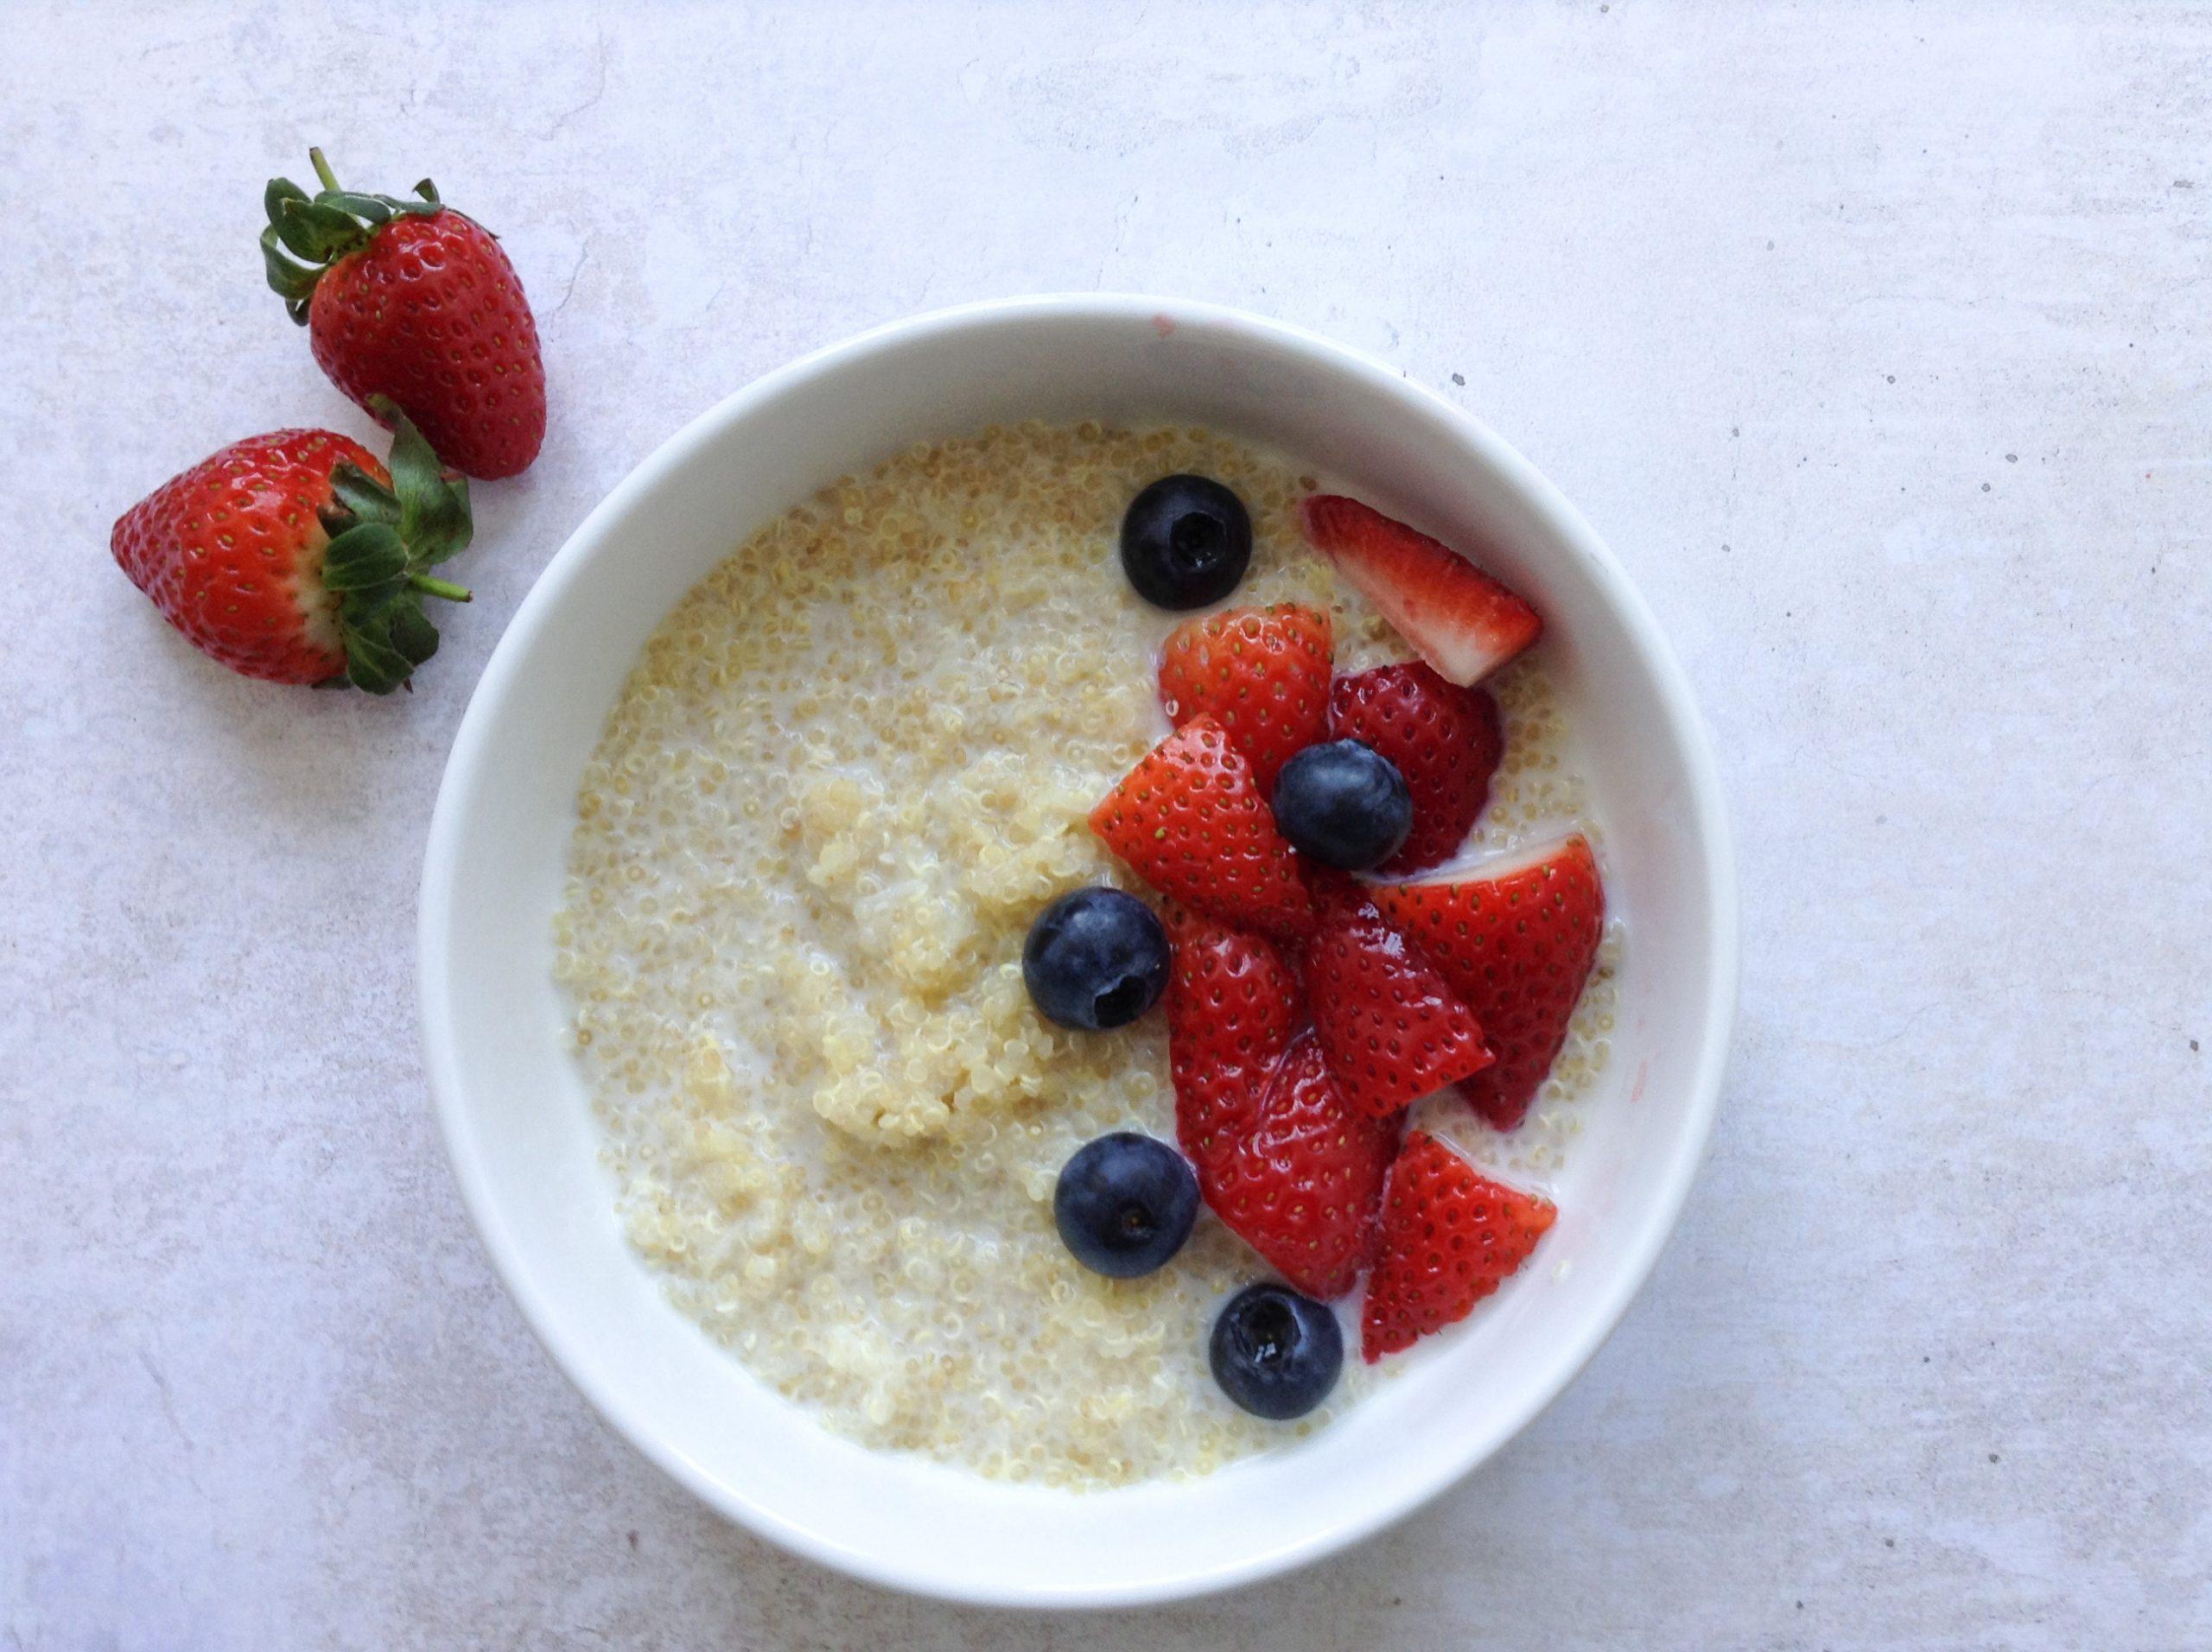 Gluten-free quinoa breakfast bowl